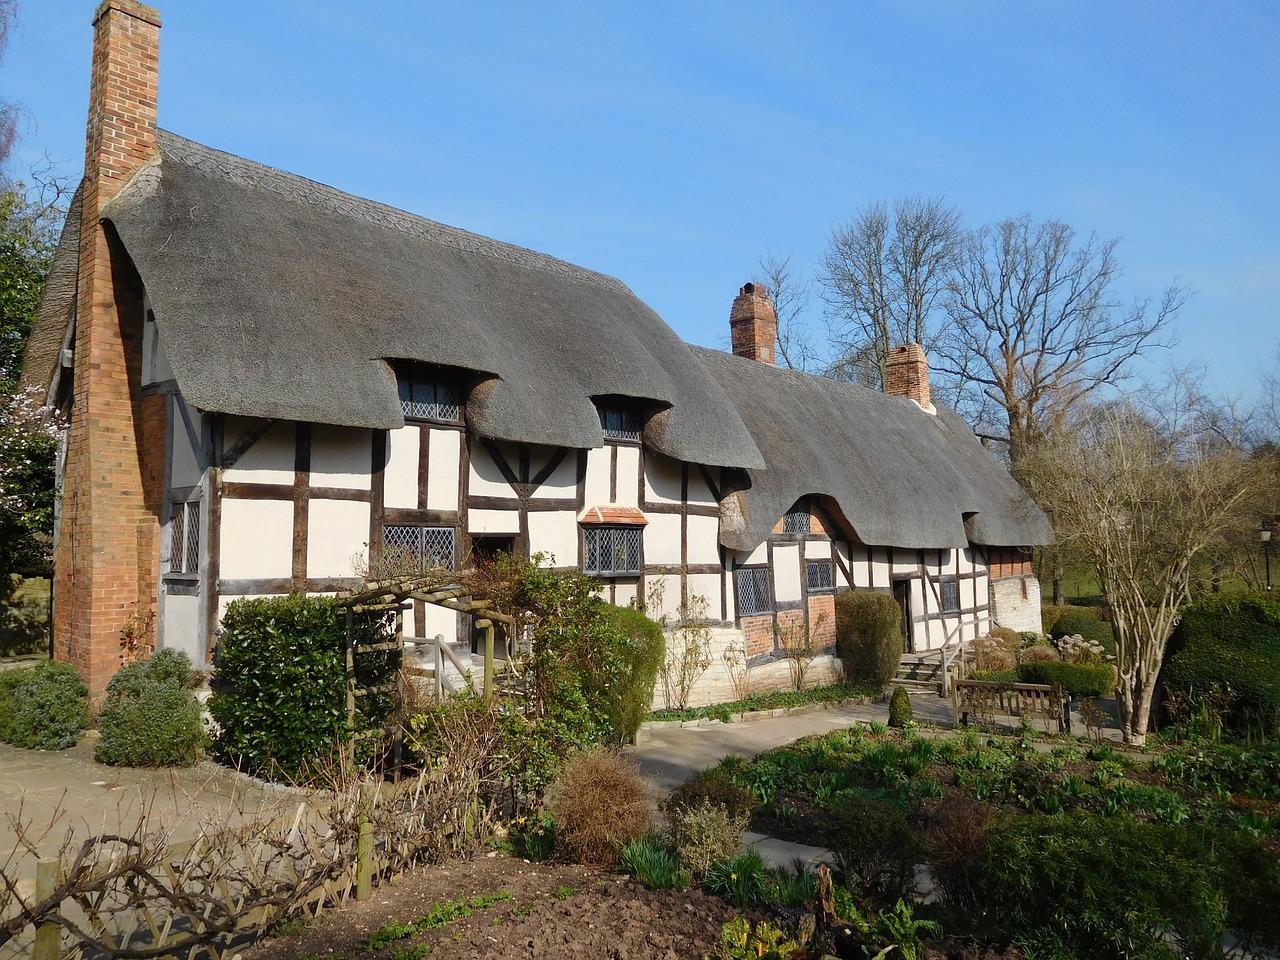 Mary Arden's cottage, Stratford Upon Avon